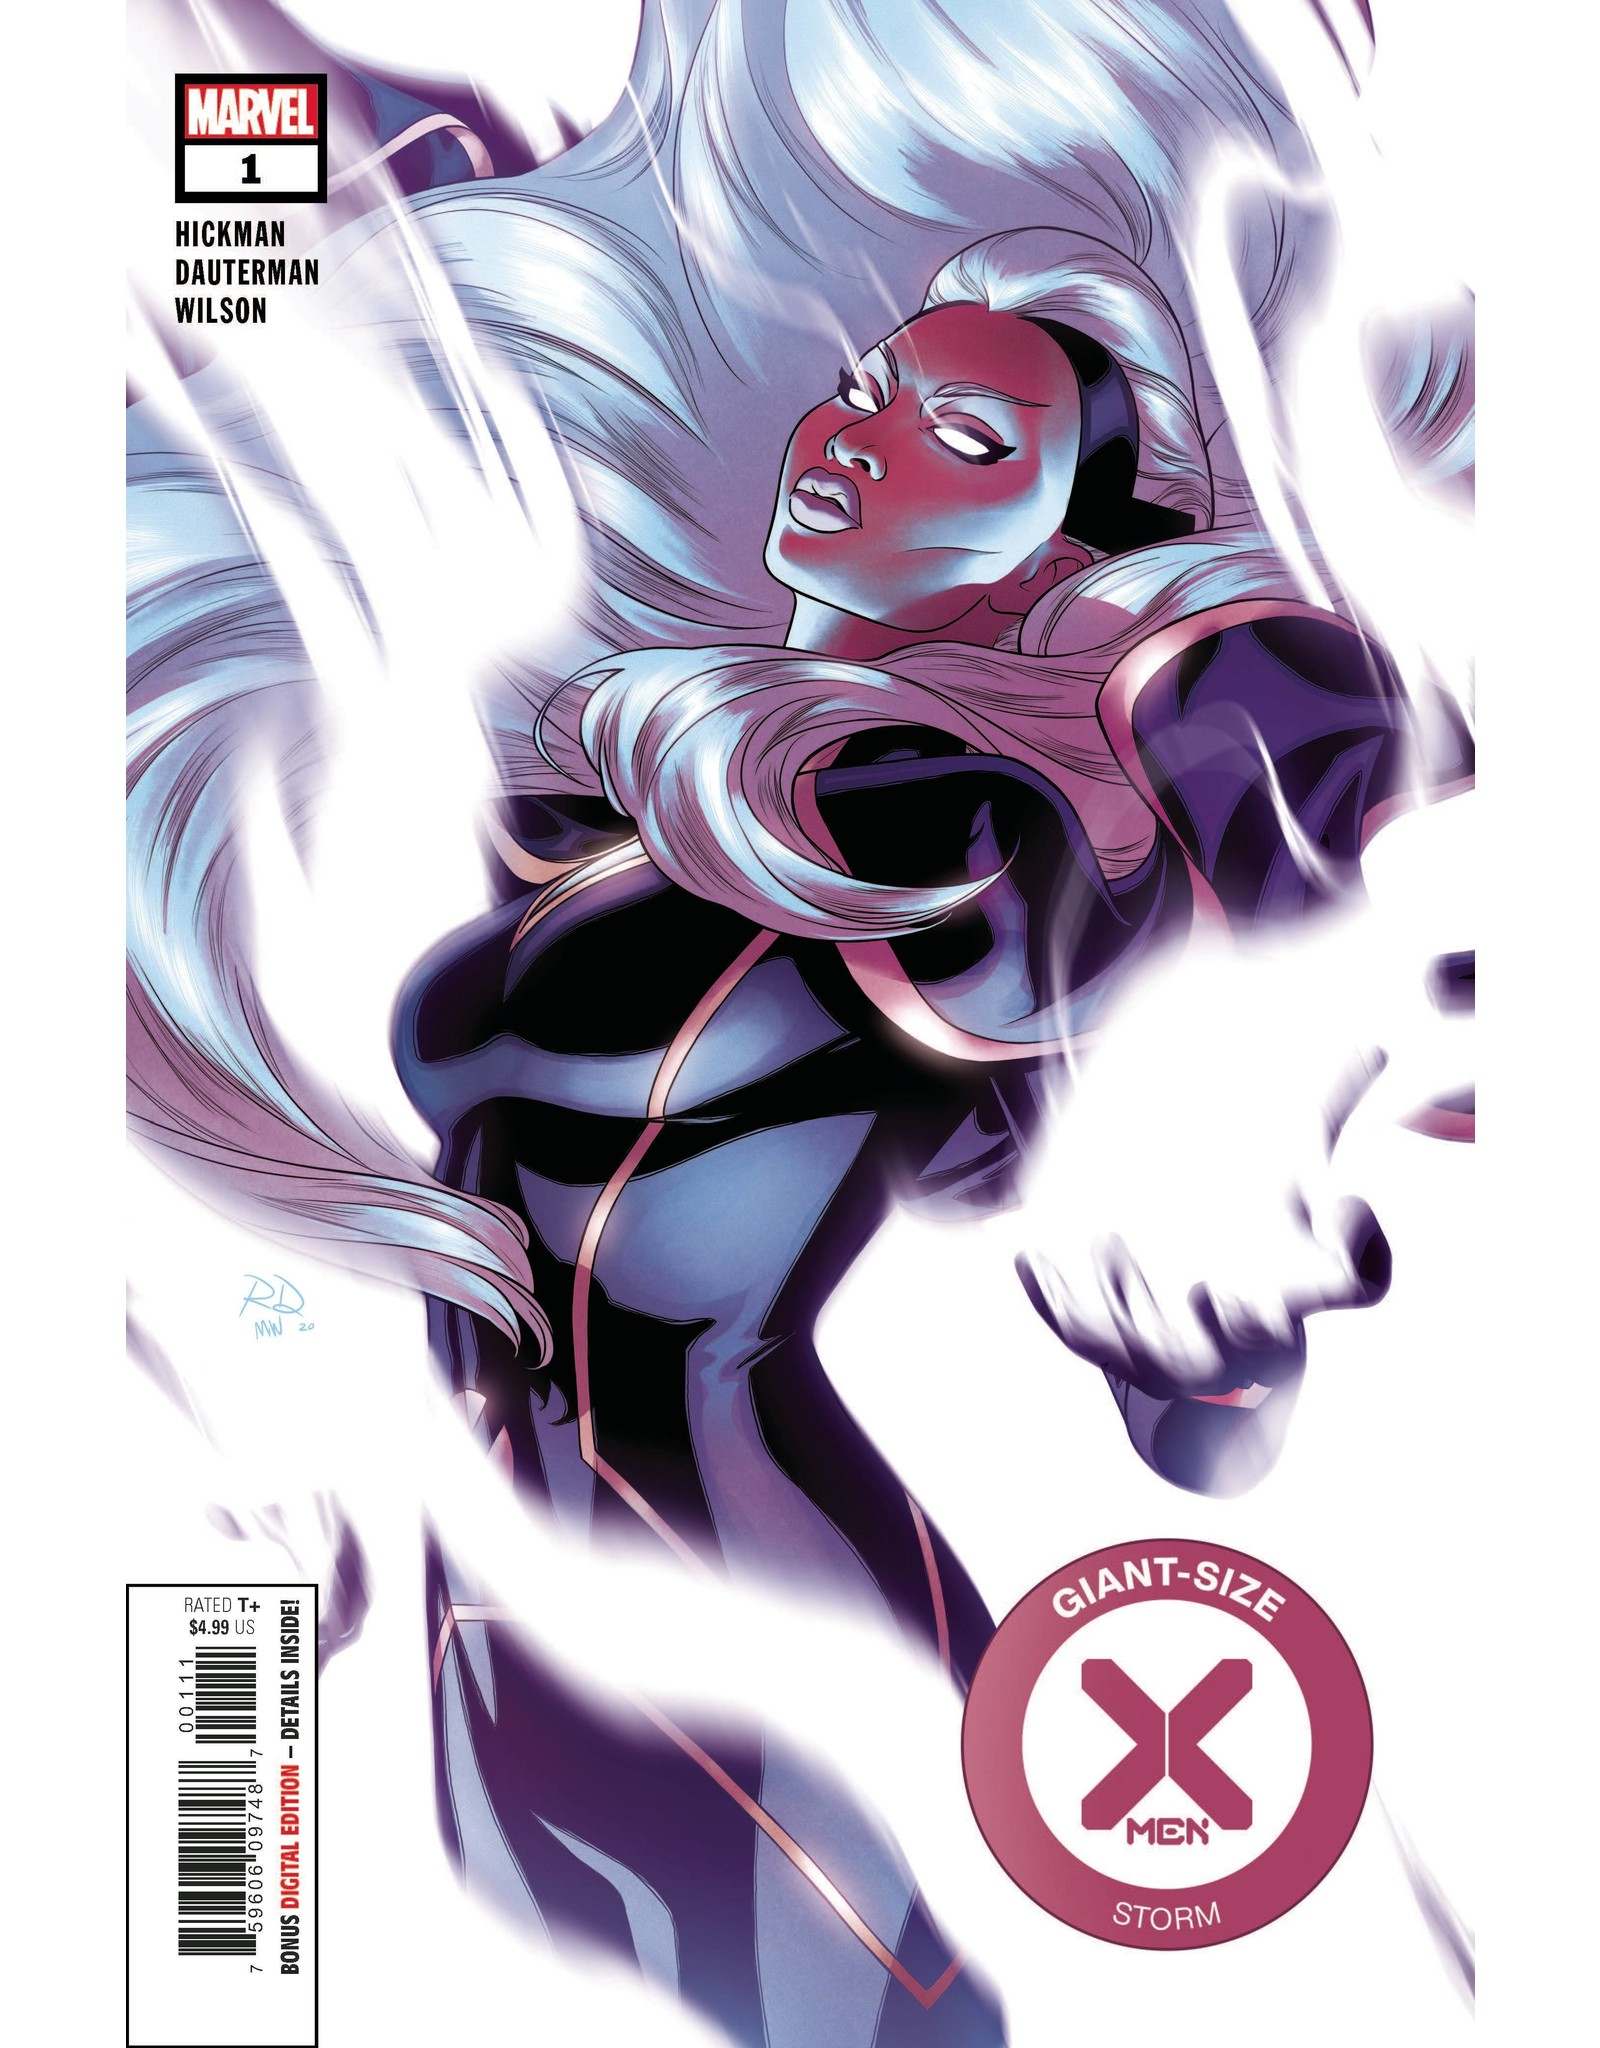 MARVEL COMICS GIANT SIZE X-MEN STORM #1